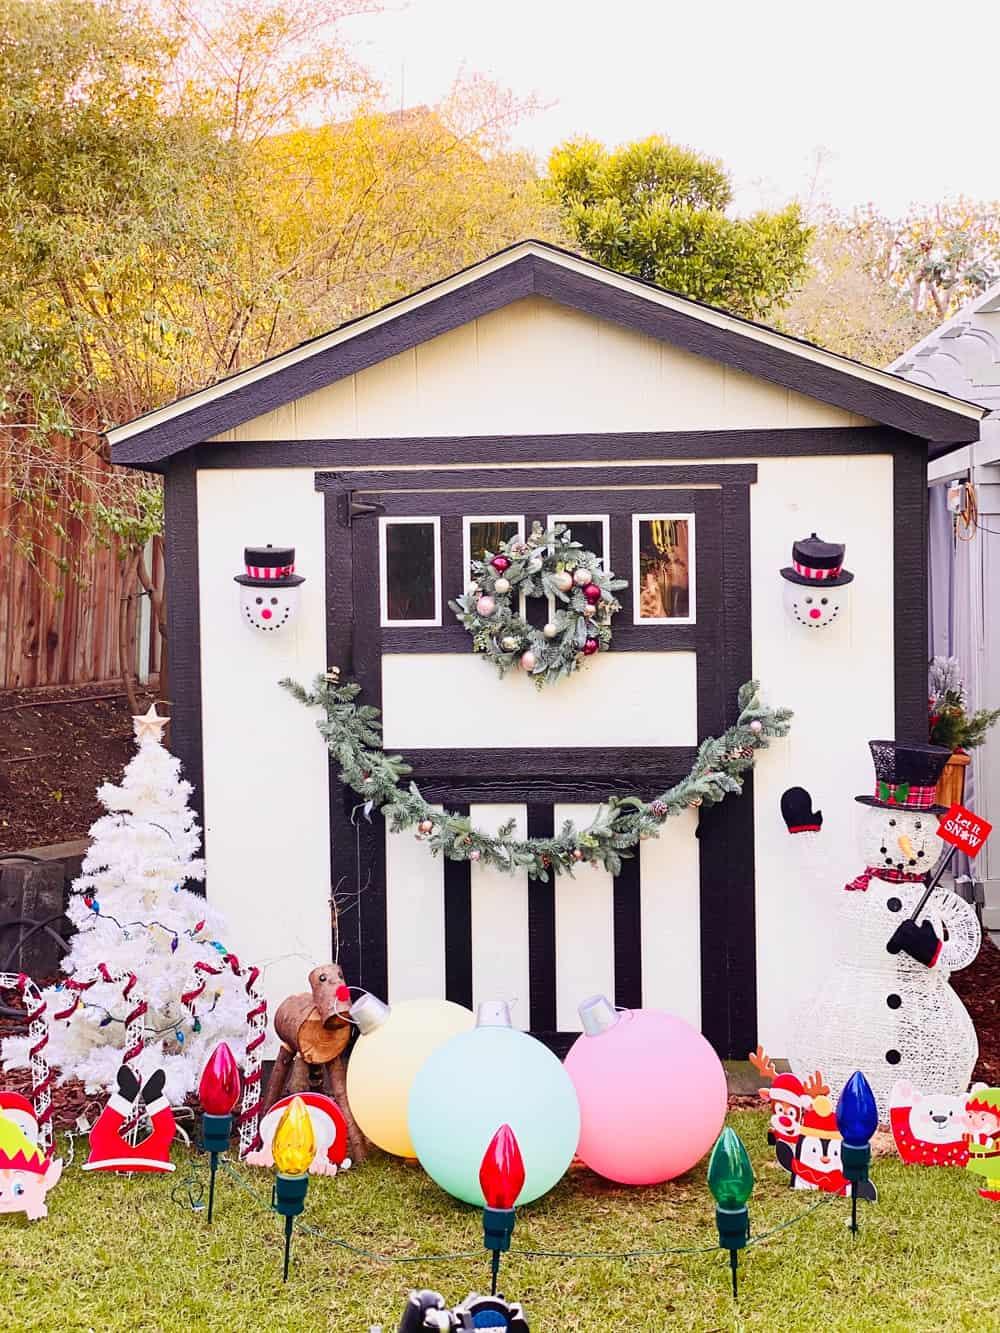 CHRISTMAS SHED PLAYHOUSE